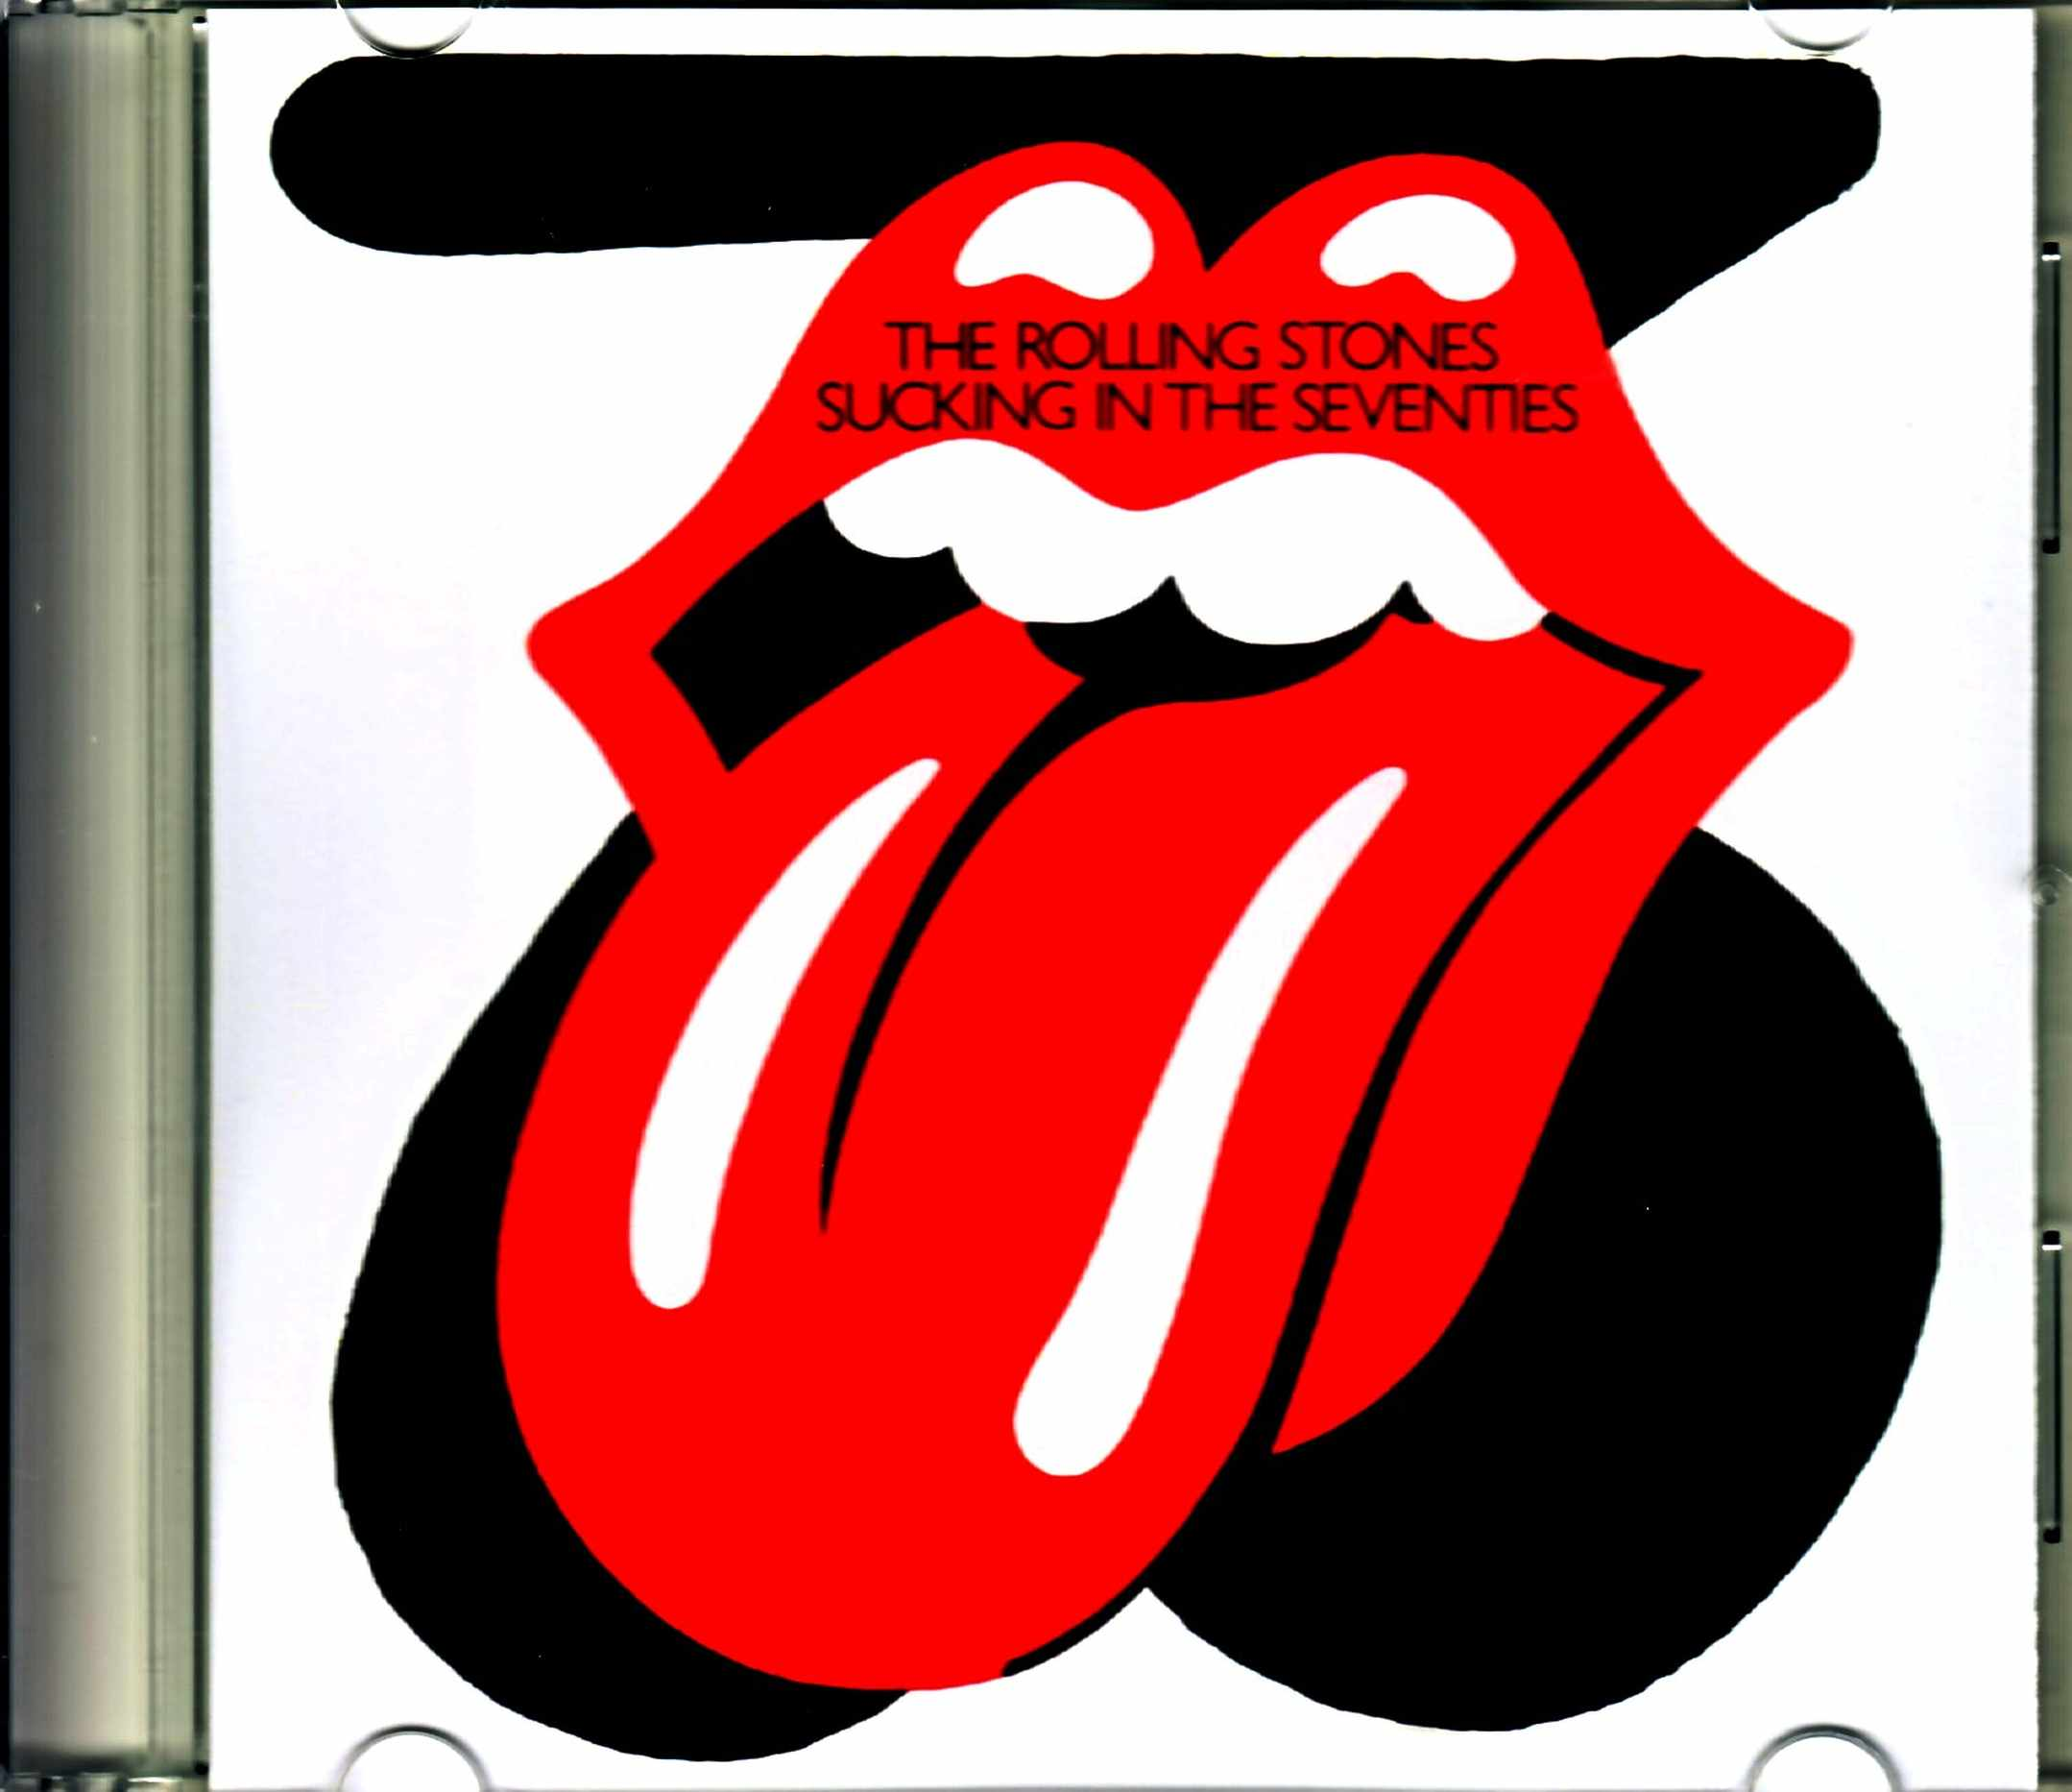 Rolling Stones ローリング・ストーンズ/70年代をパクパクしちゃうぞ Sucking in the Seventies UK Test Pressing LP